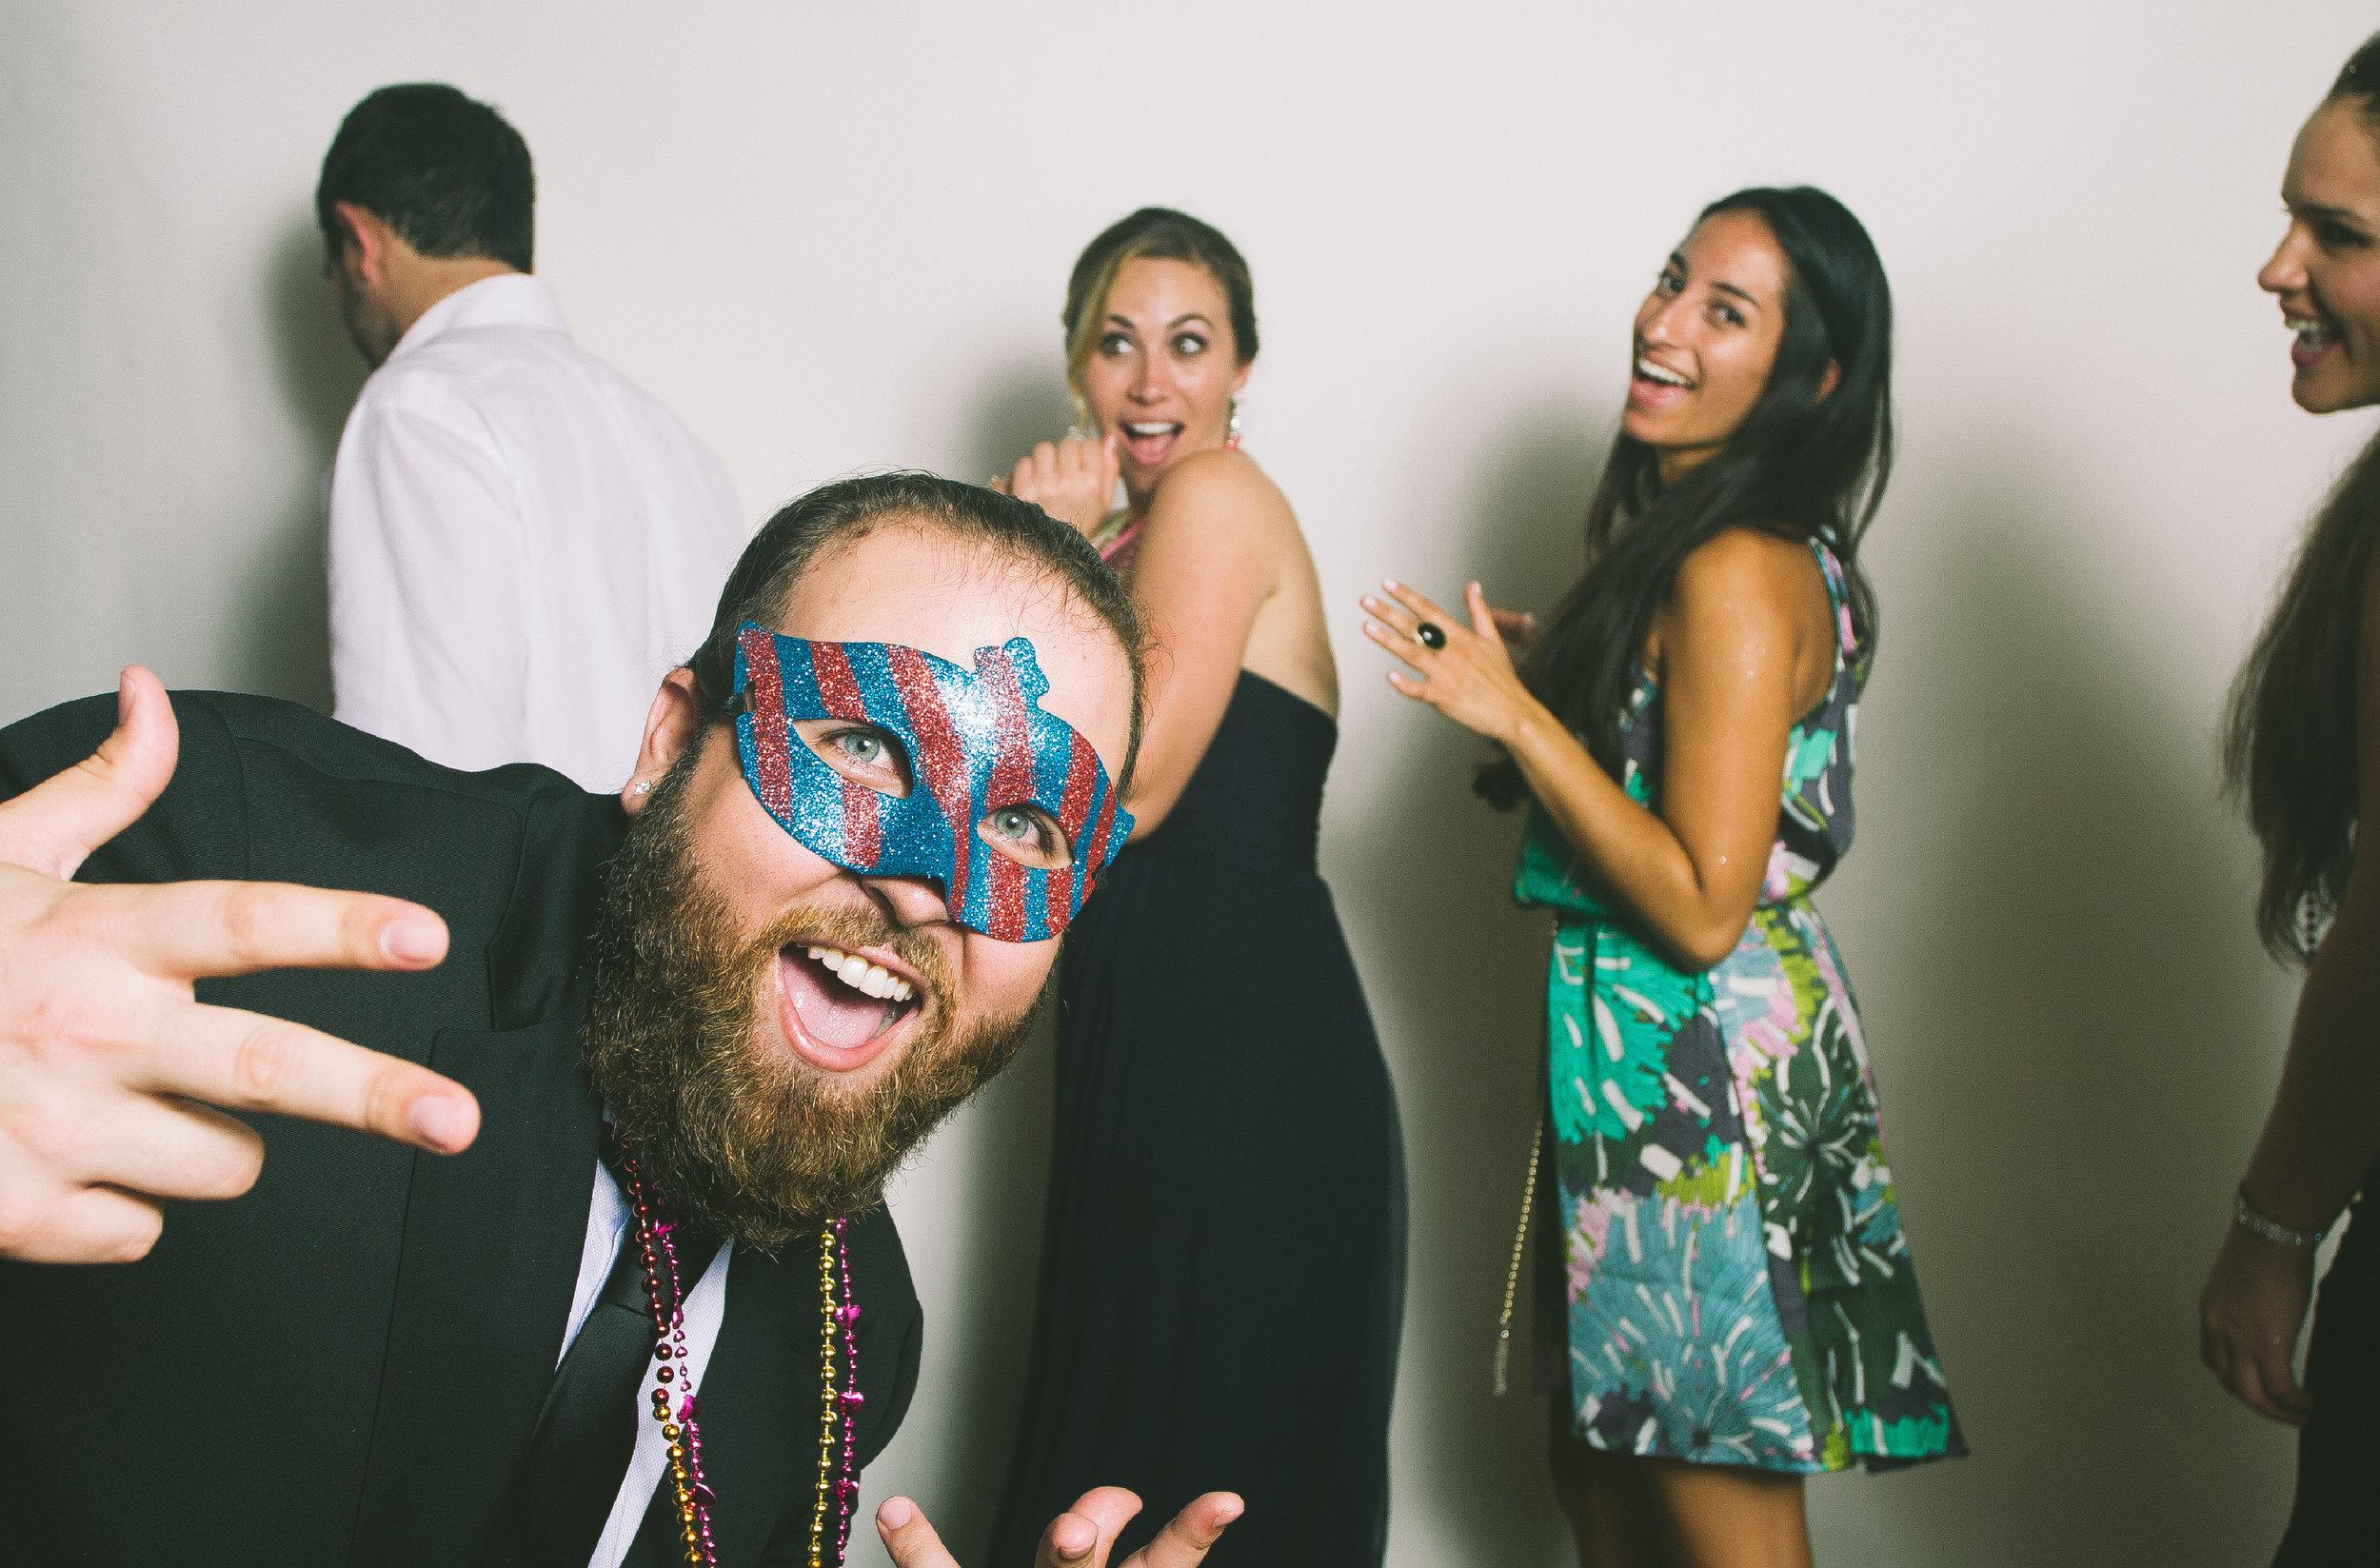 Marelys + Oscar Wedding Wackybooth Photobooth45.jpg